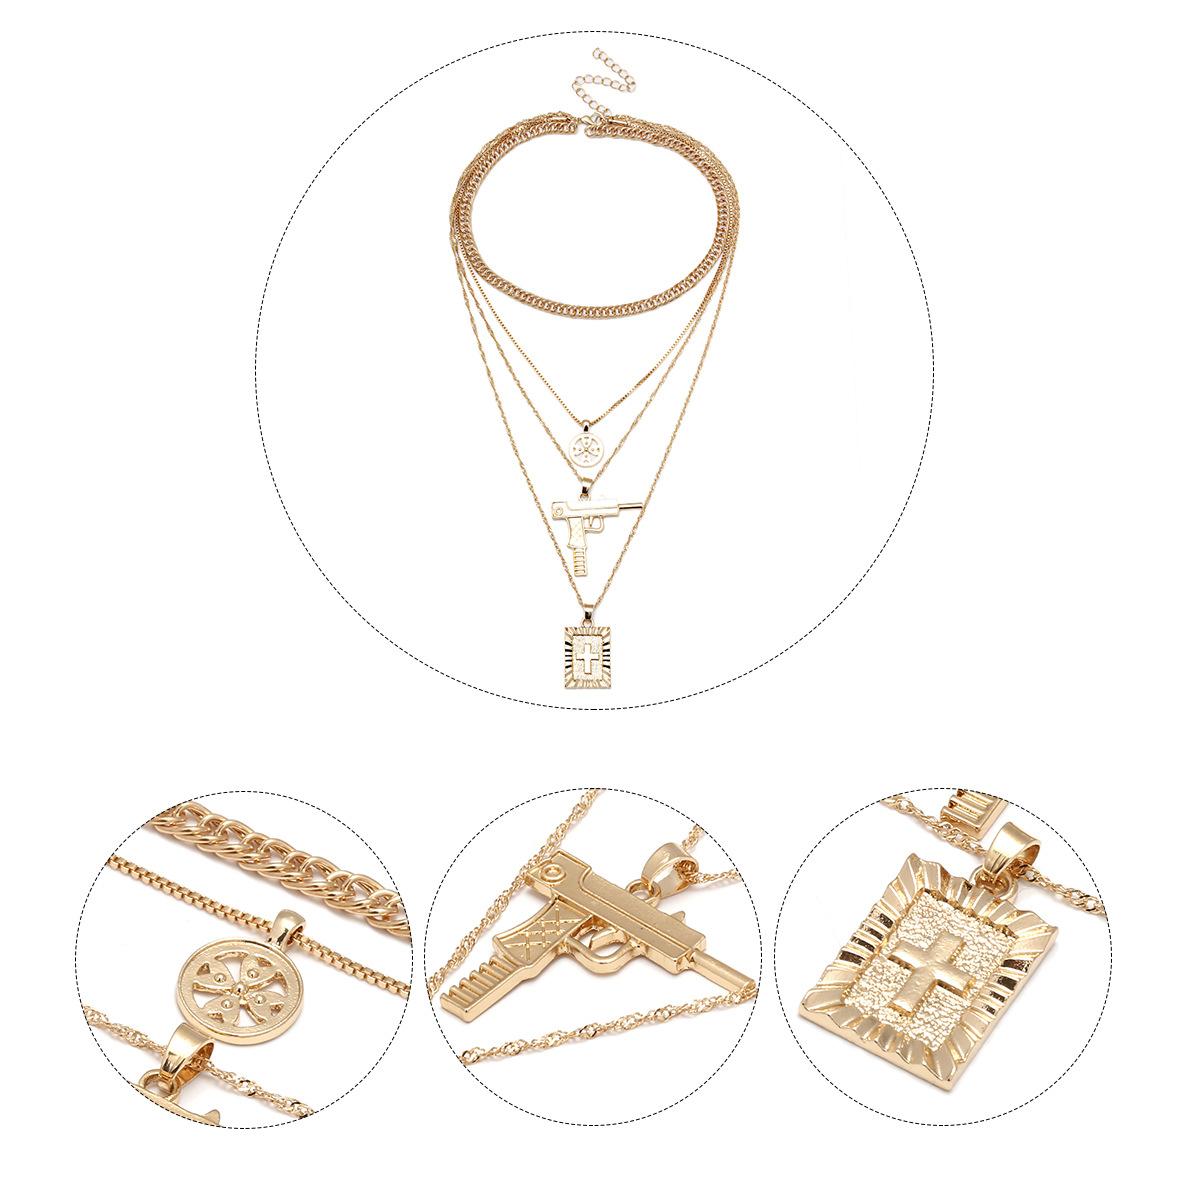 Alloy Fashion Geometric necklace(Golden) NHXR2263-Golden